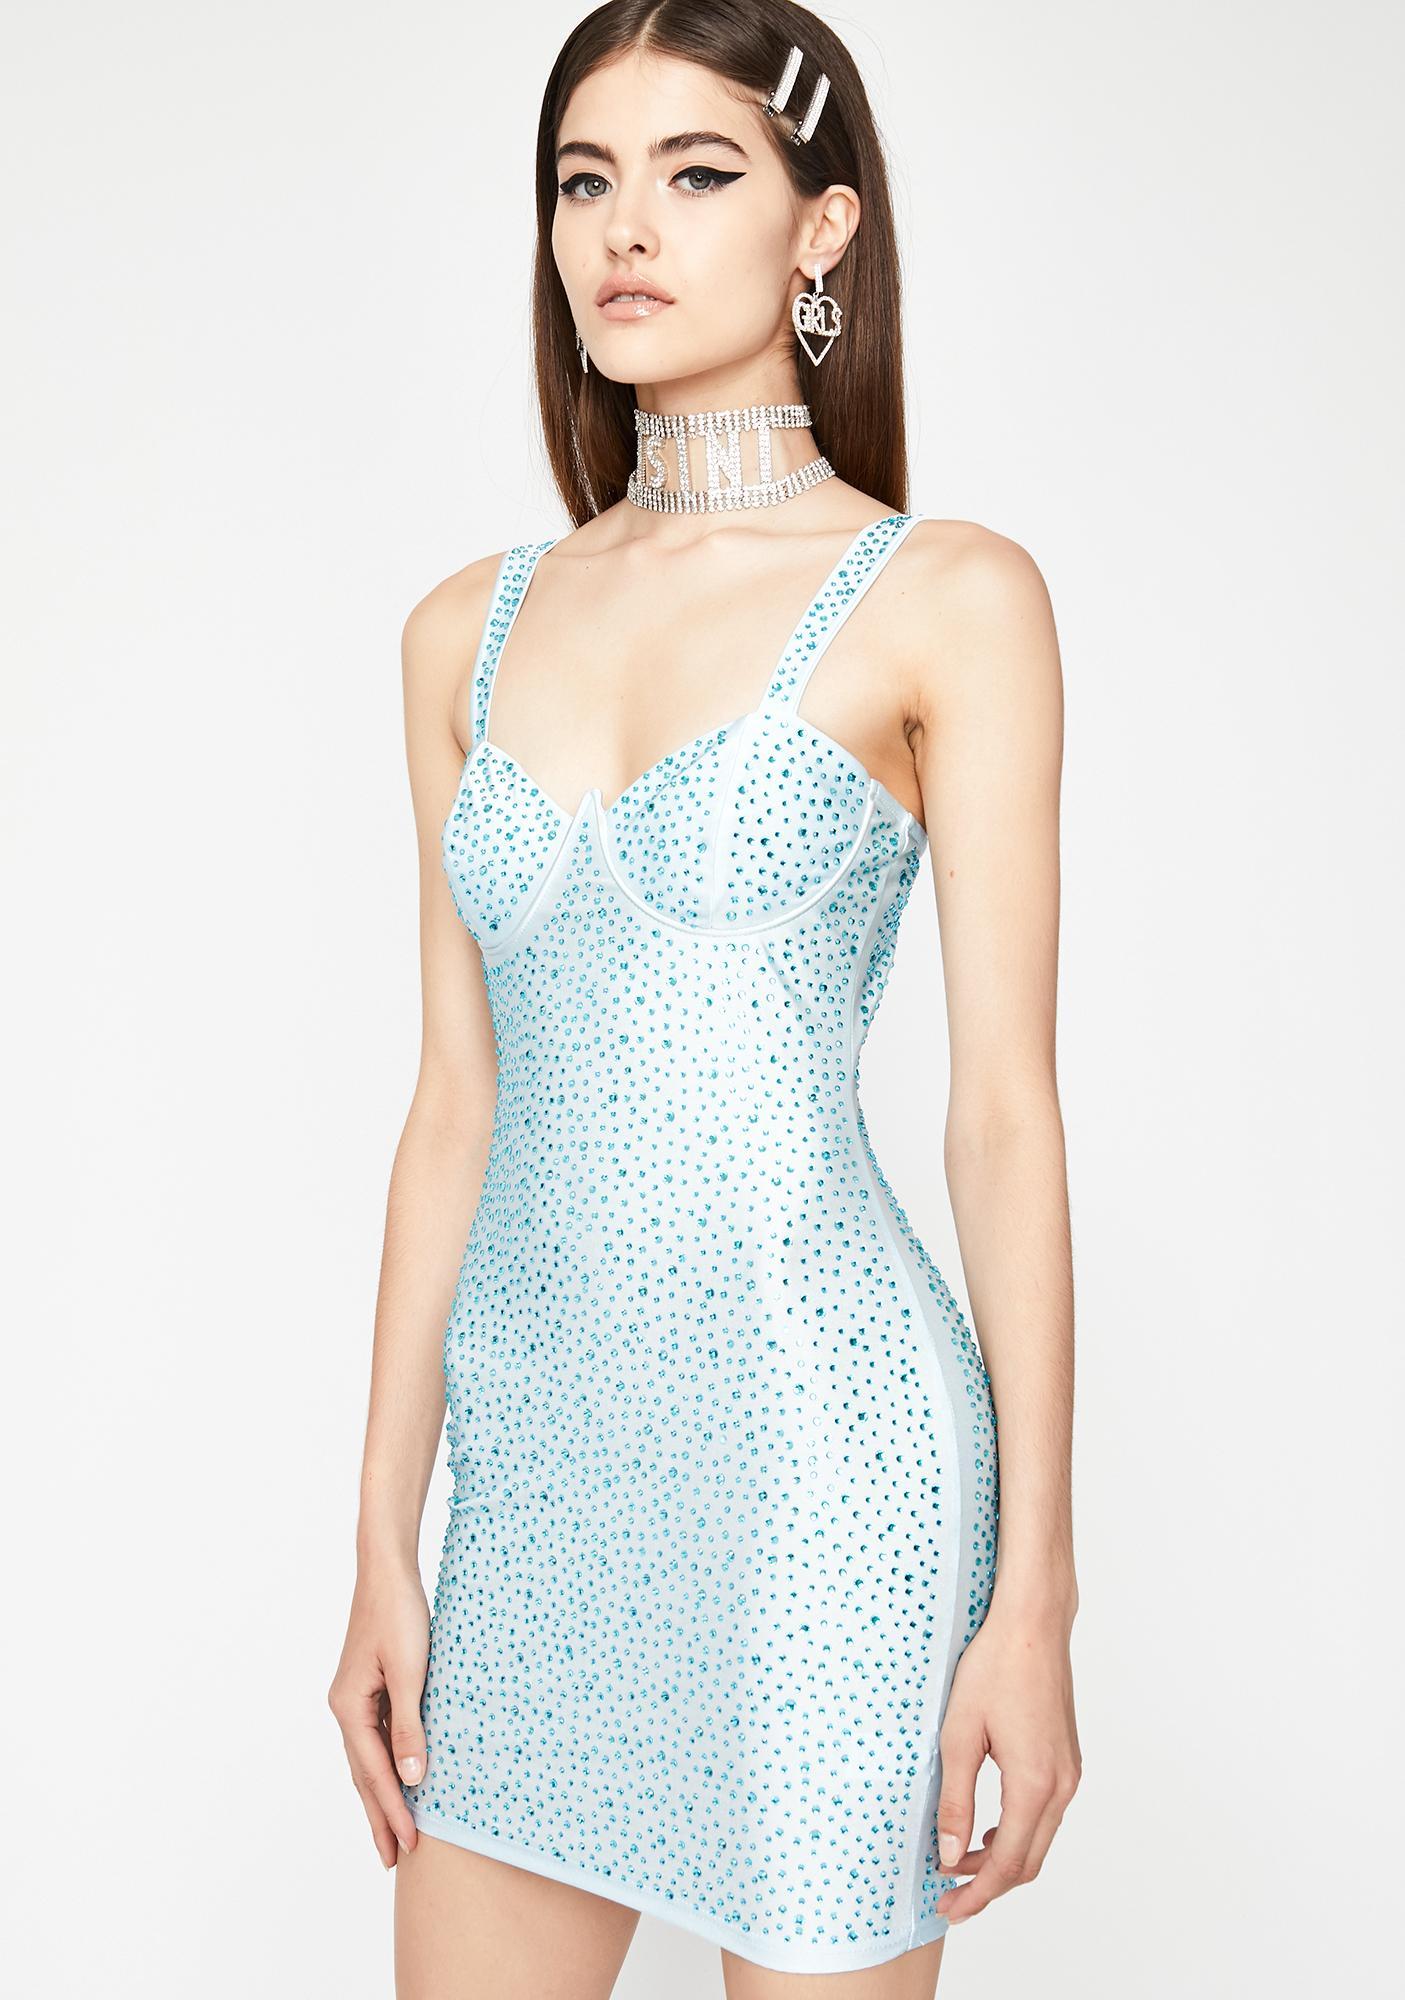 Berry Fab Flare Rhinestone Dress